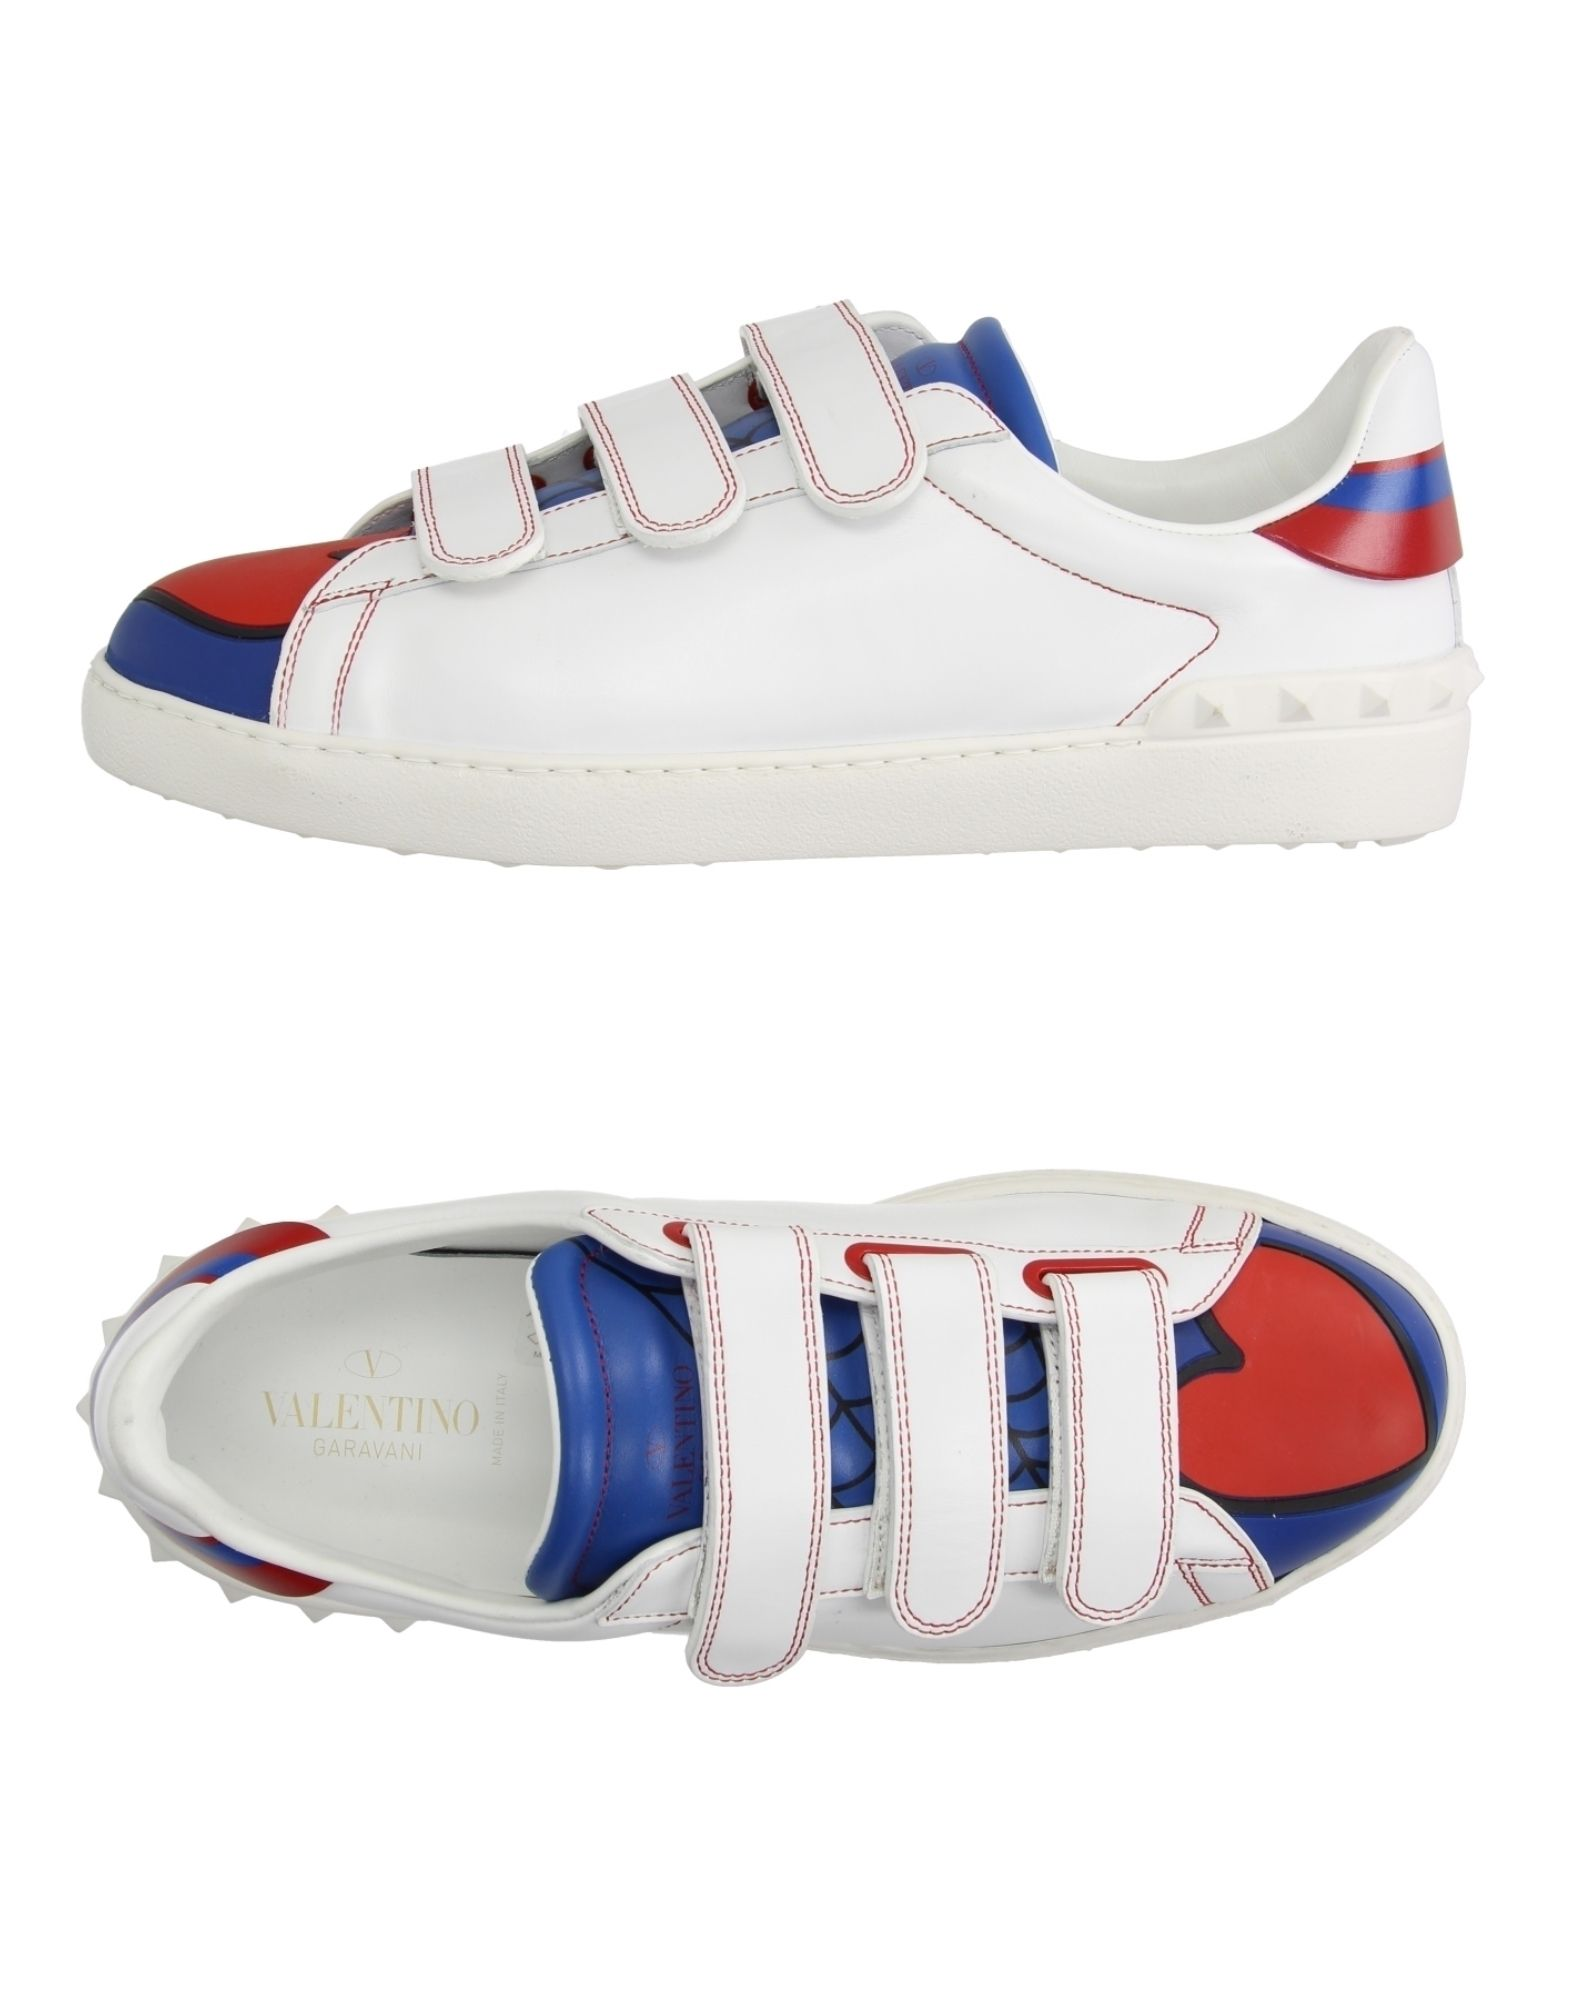 Valentino Garavani Sneakers Herren beliebte  11189744LW Gute Qualität beliebte Herren Schuhe a400cf